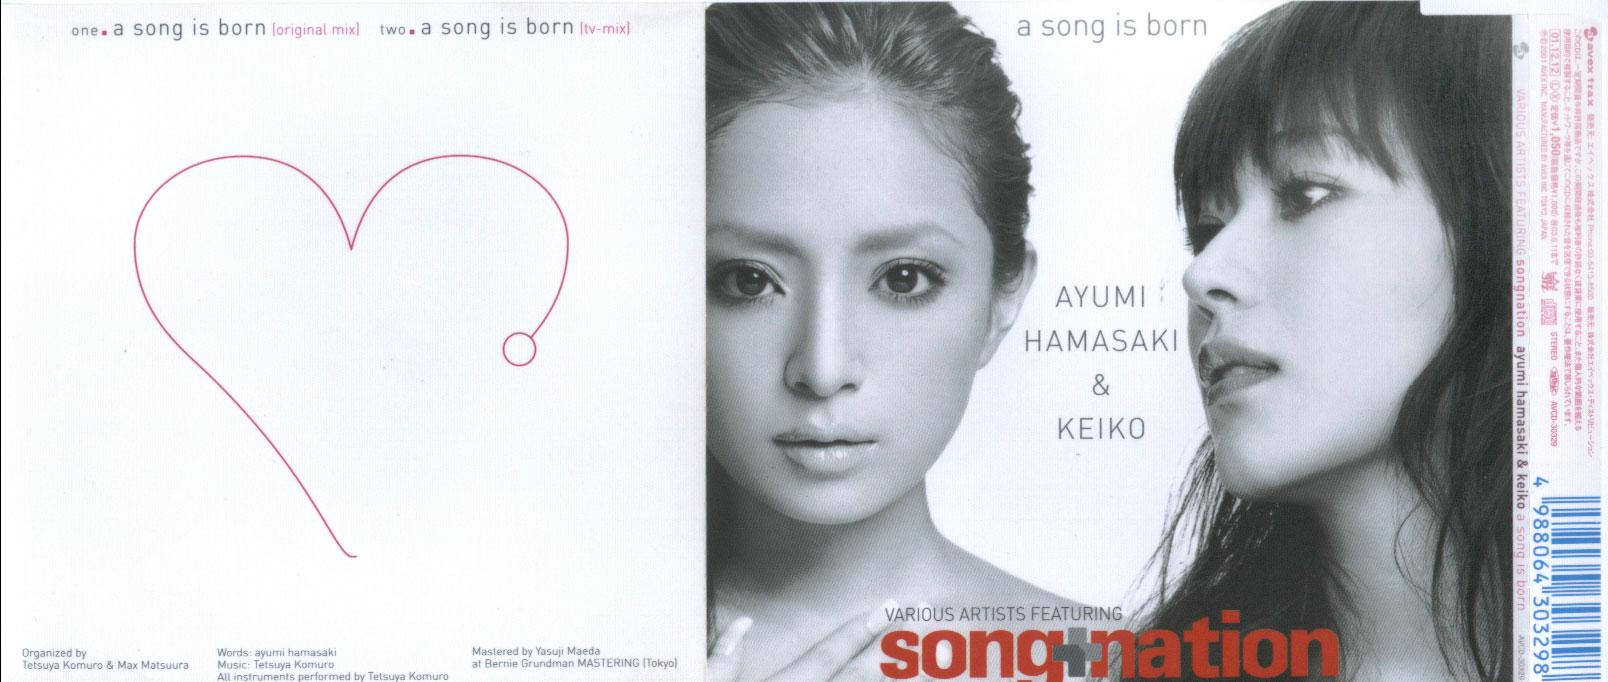 Ayumi Hamasaki (浜崎あゆみ): a song is born | Music Pixels